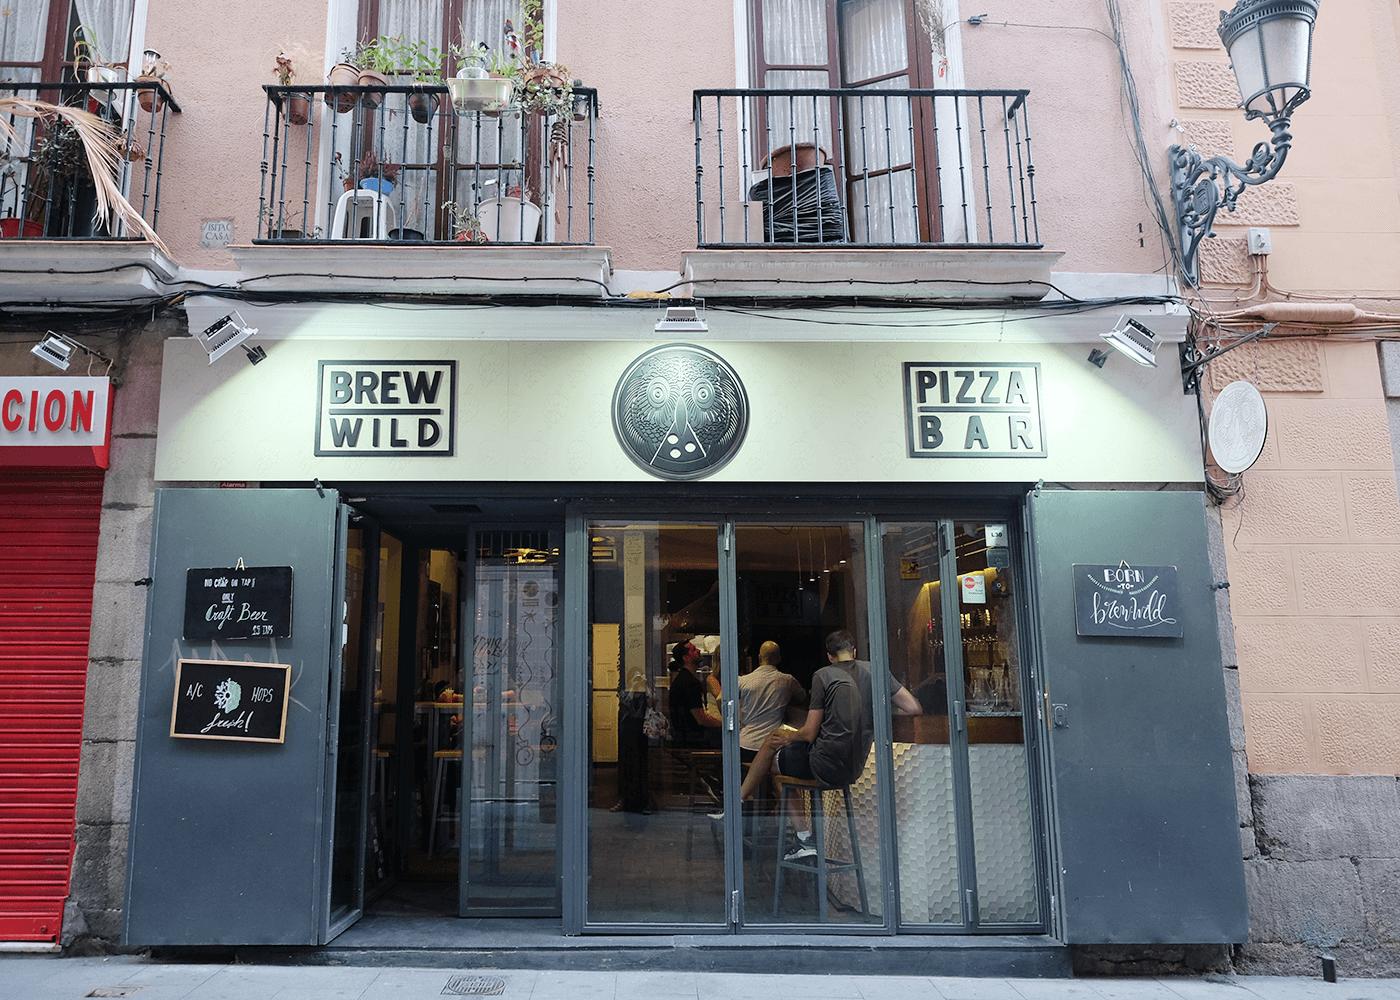 Pizza Bar Brew Wild(ピザバー ブリューワイルド)